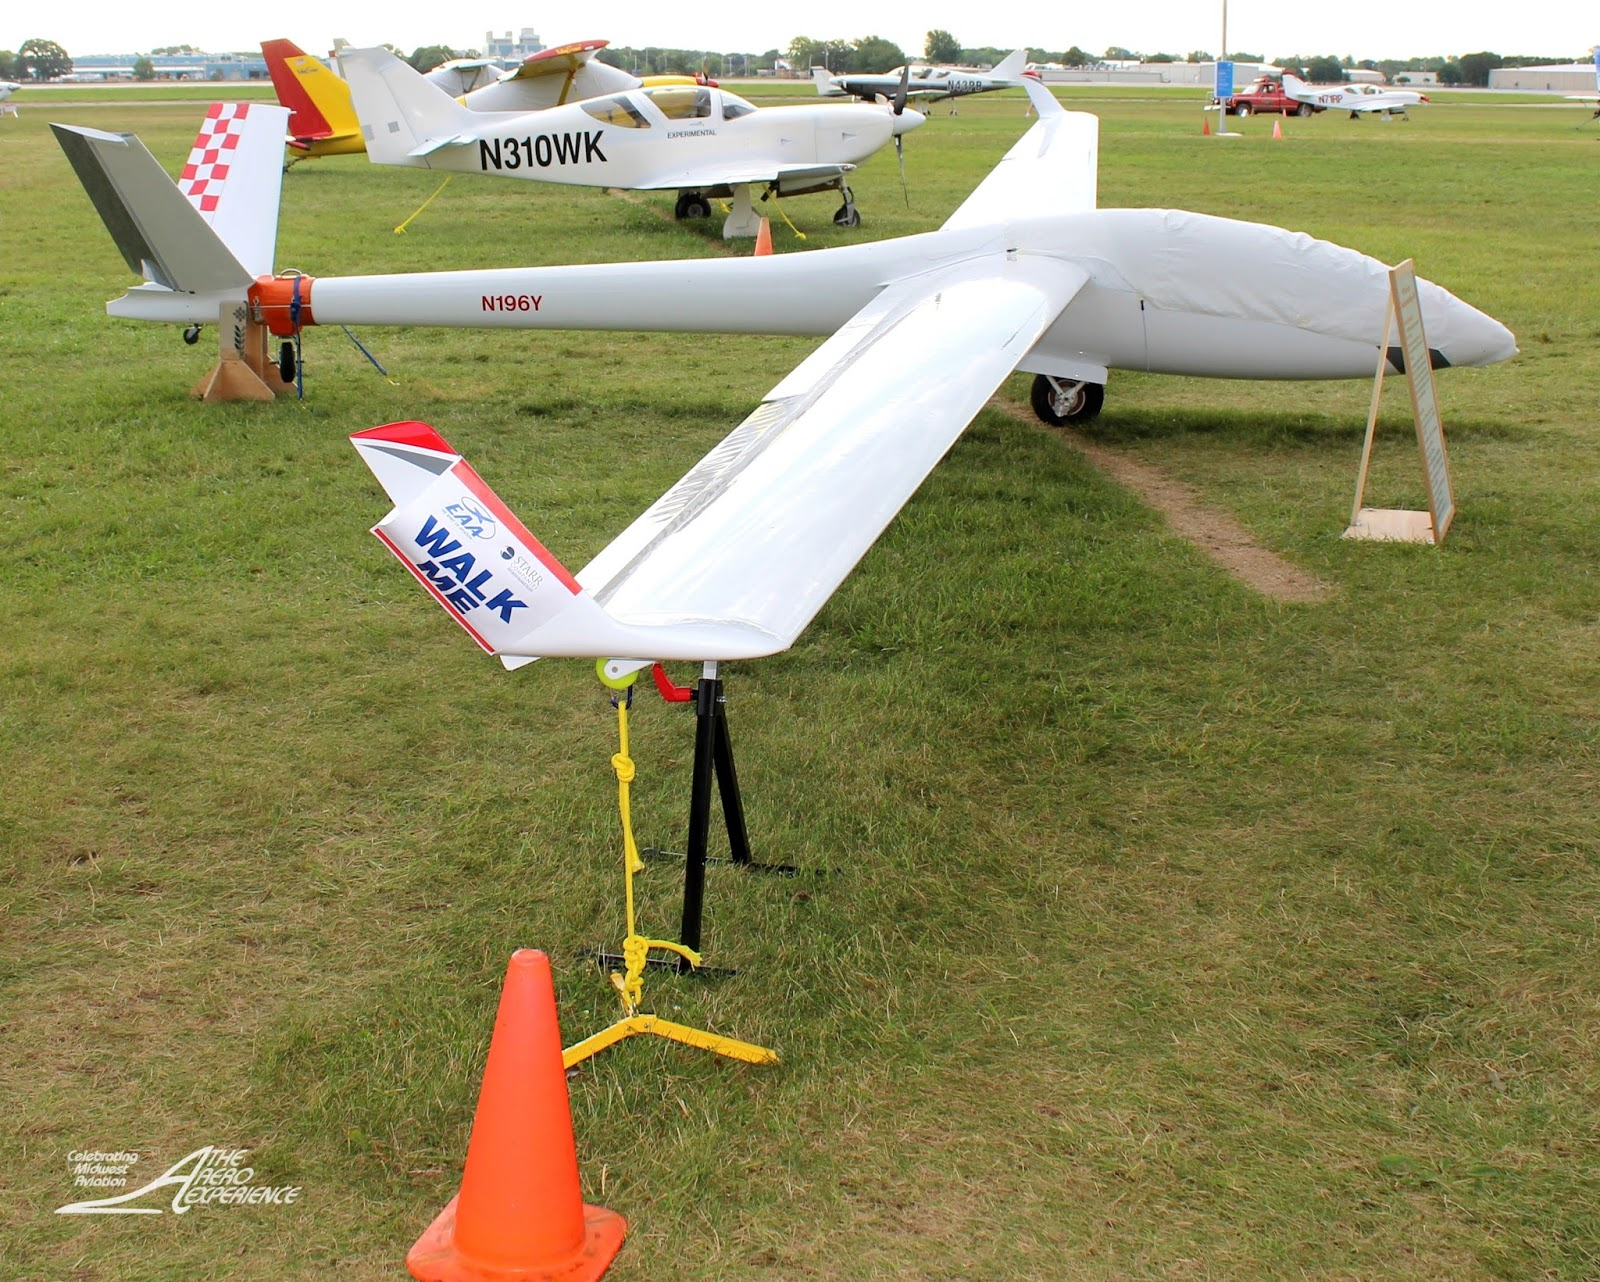 EAA AIRVENTURE OSHKOSH 2016: EXPERIMENTAL AIRCRAFT